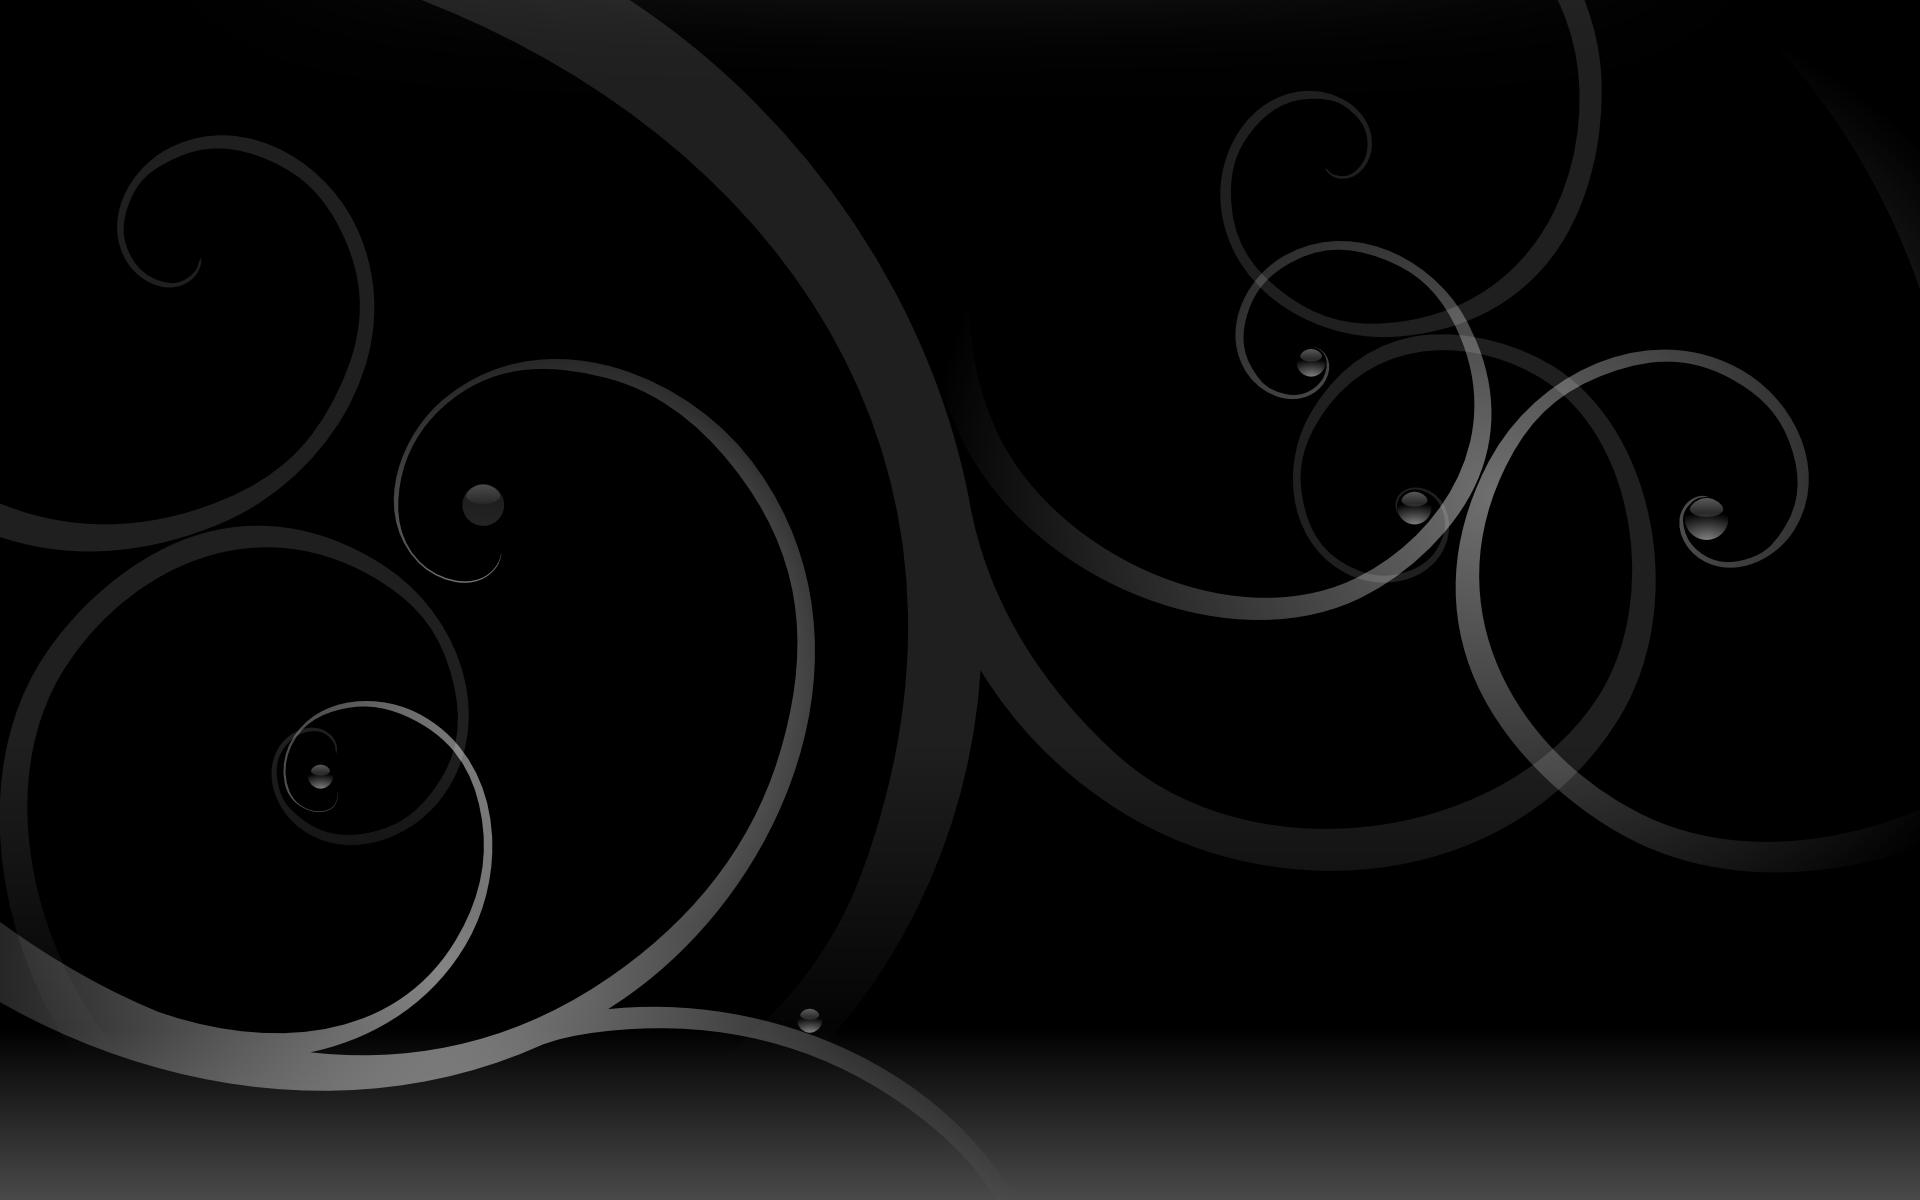 Black Wallpaper Background images on o